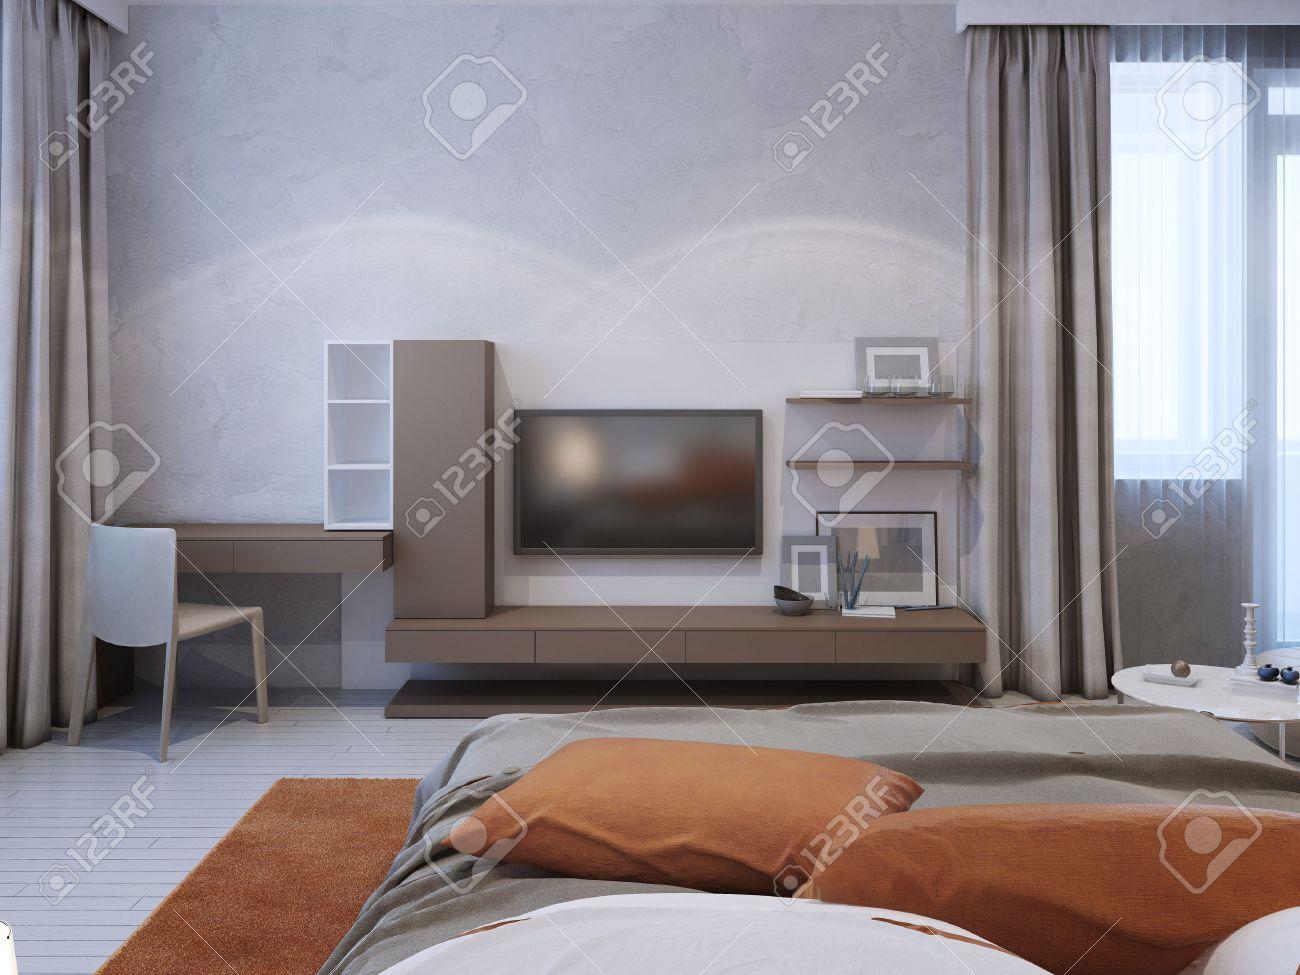 s pin bedroom net modern contemporary behance gallery